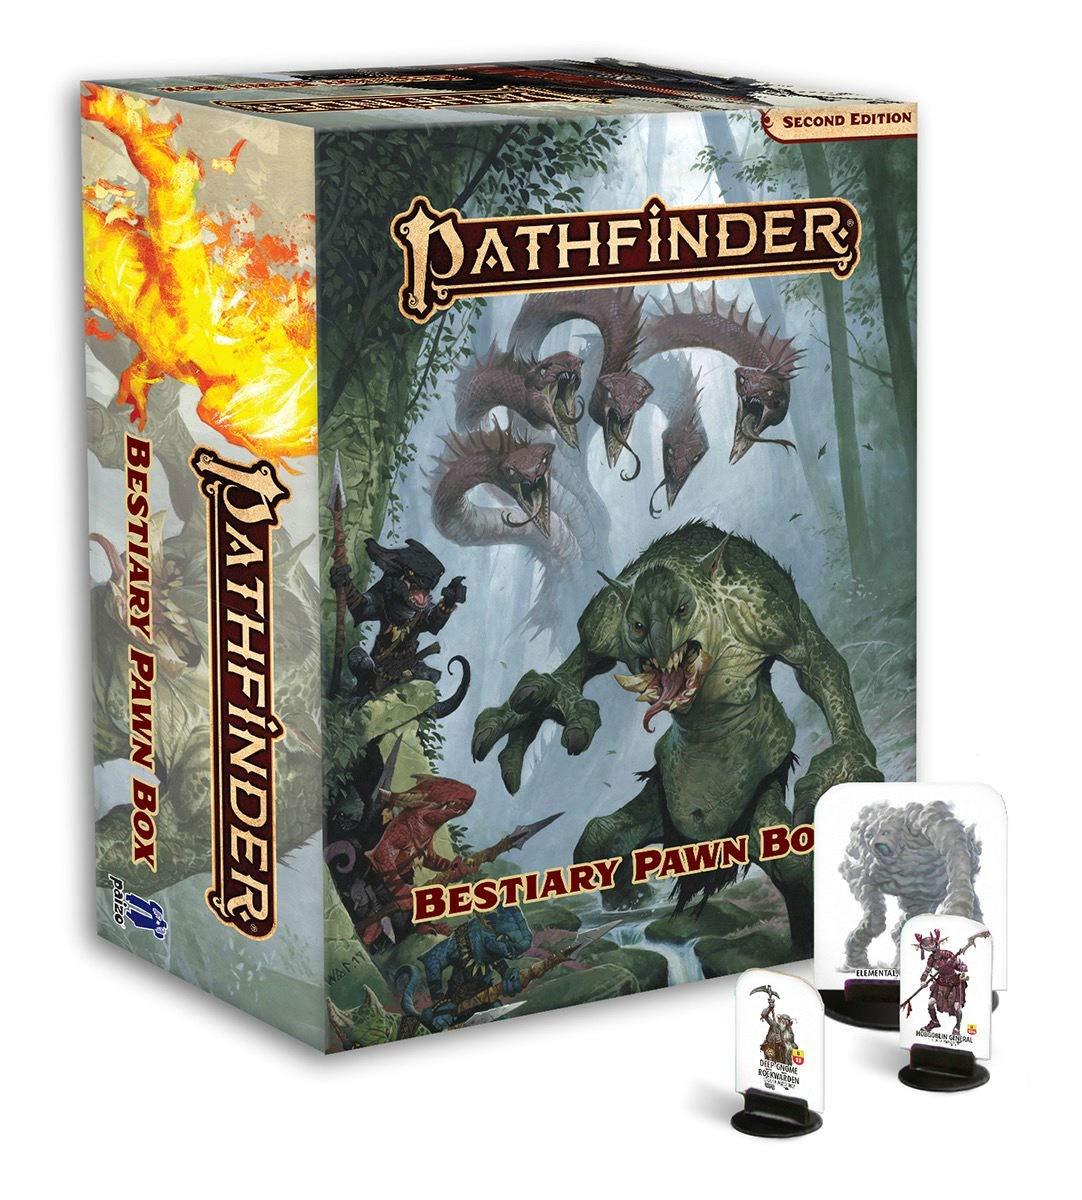 Pathfinder RPG Second Edition: Bestiary Pawn Box